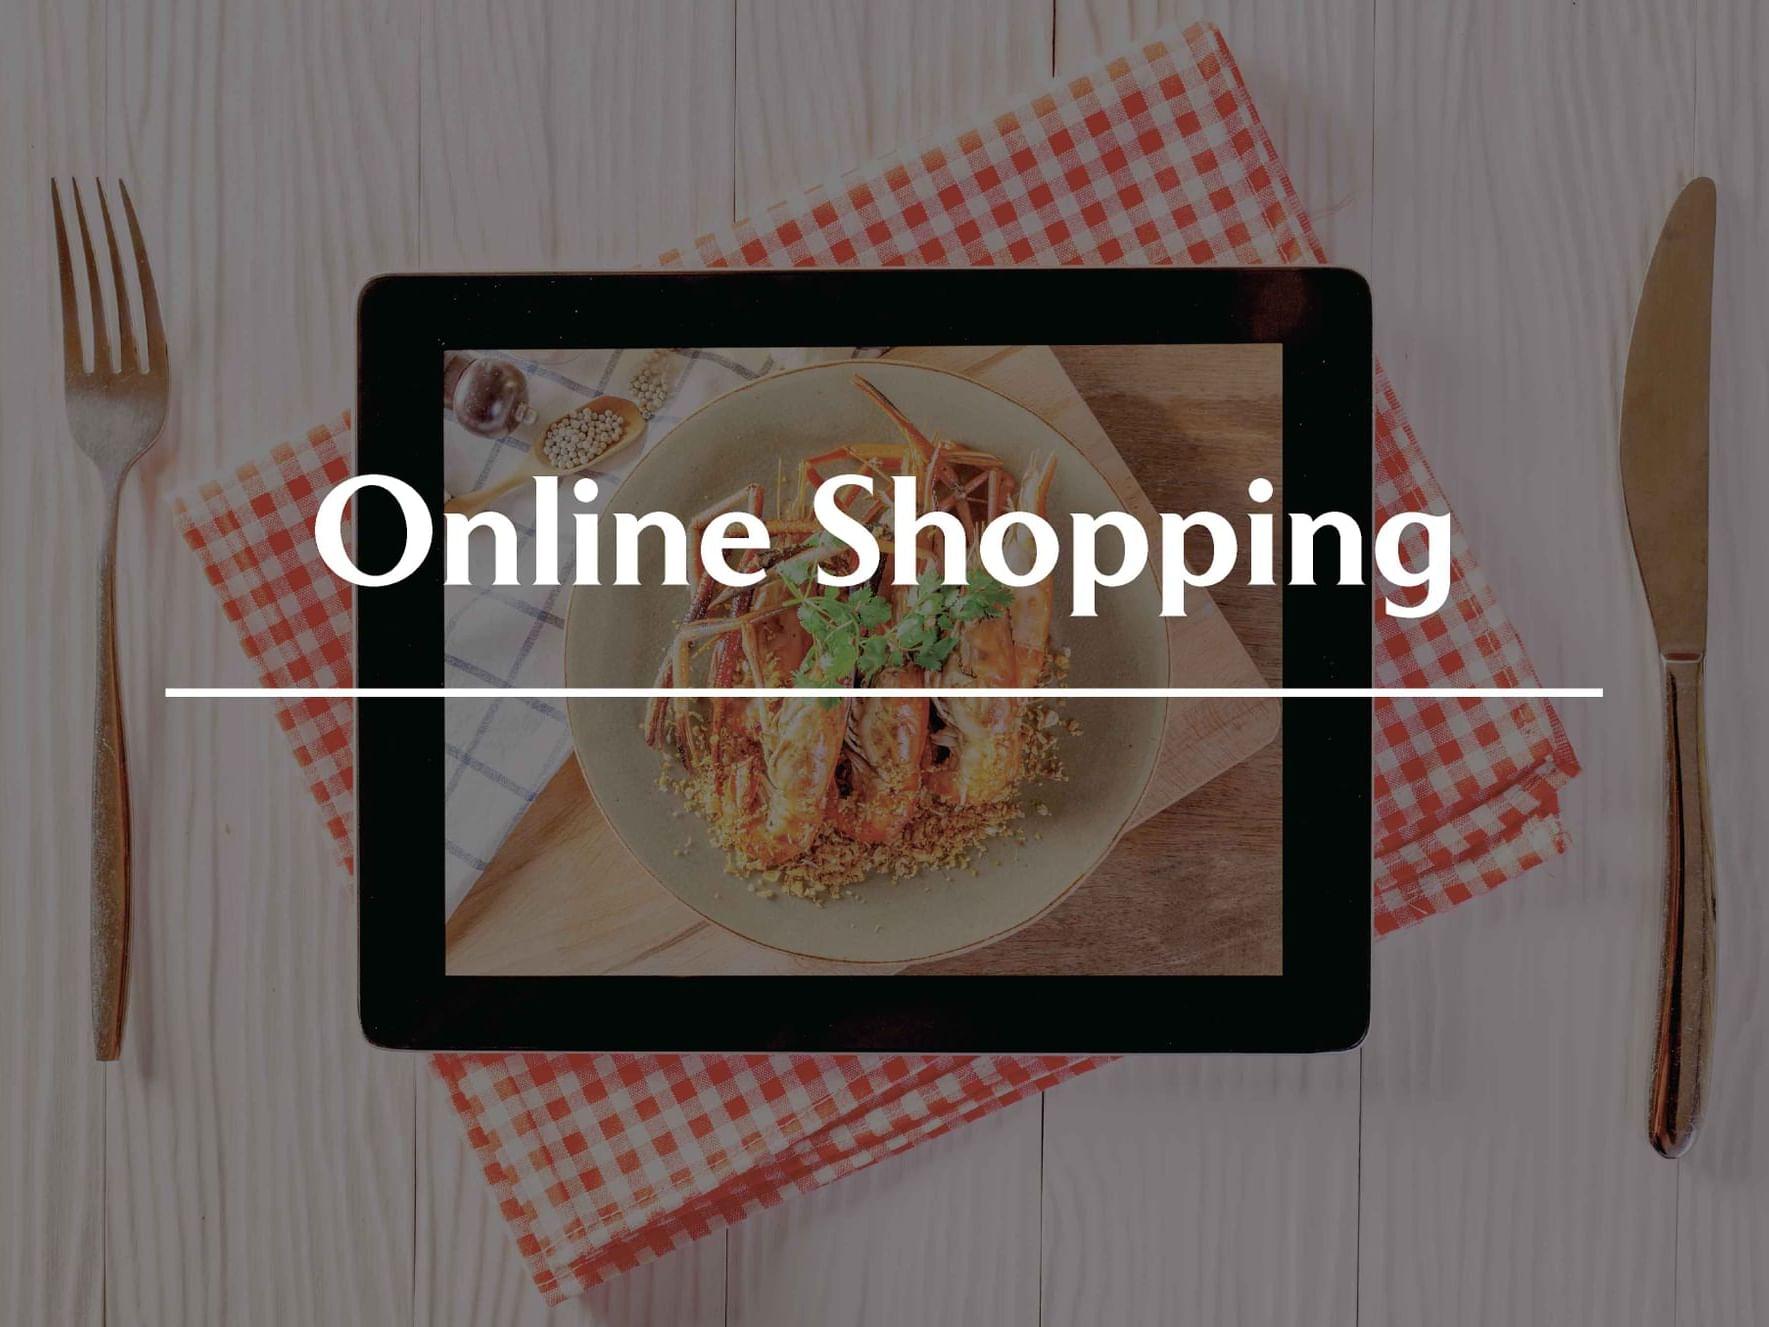 A poster online shopping at The Saujana Hotel Kuala Lumpur